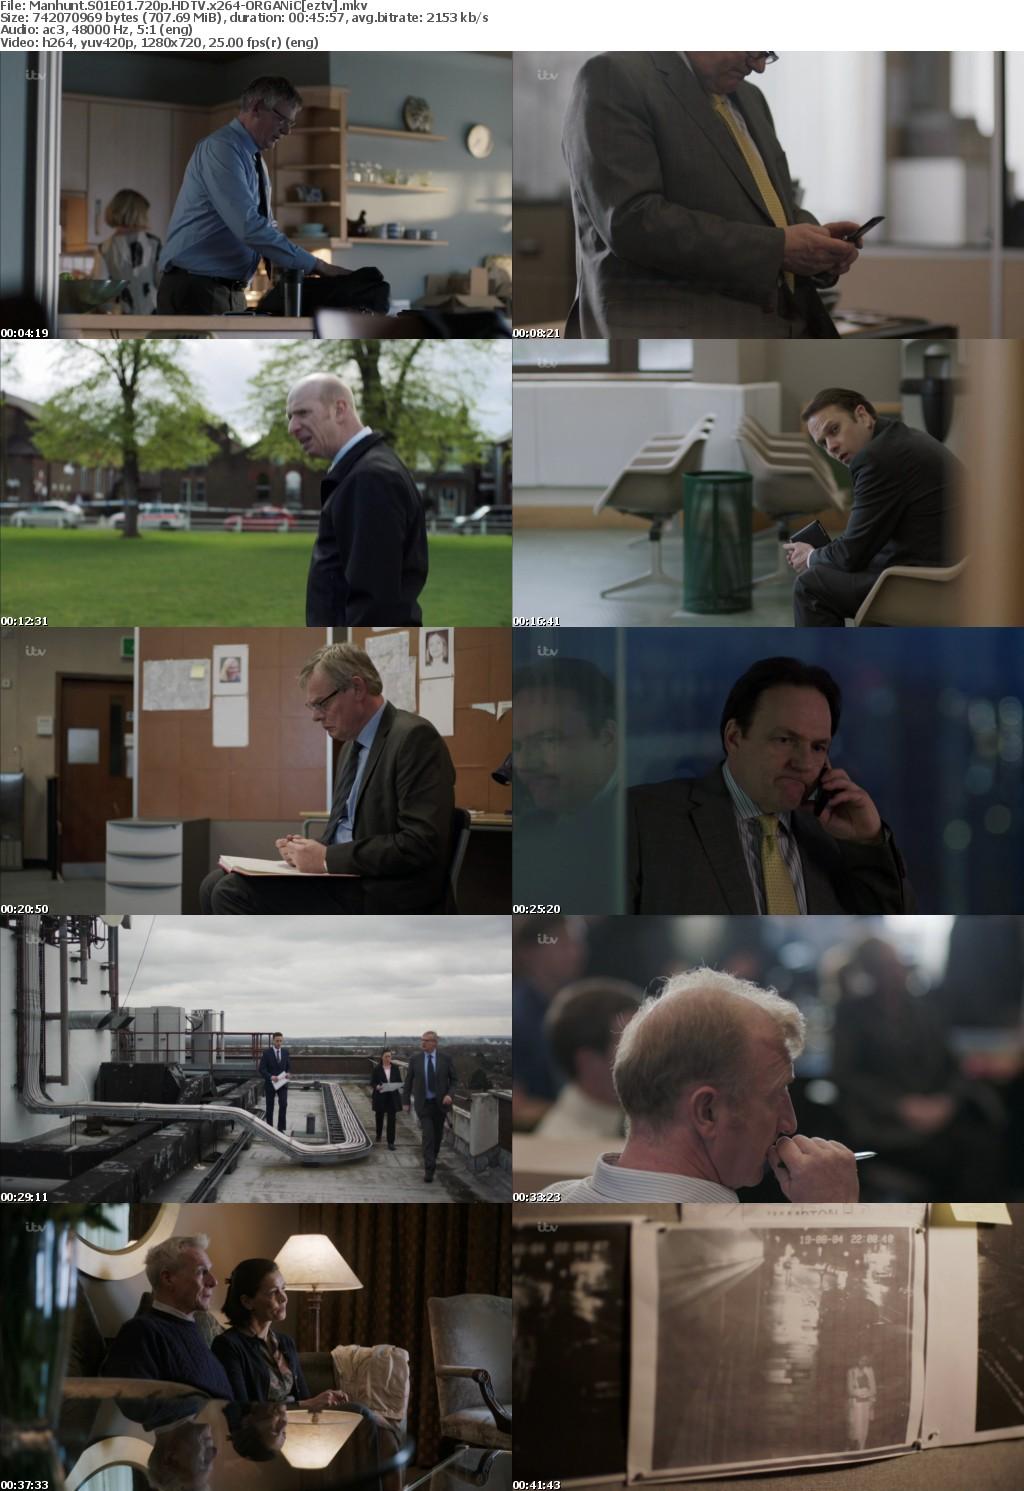 Manhunt S01E01 720p HDTV x264-ORGANiC